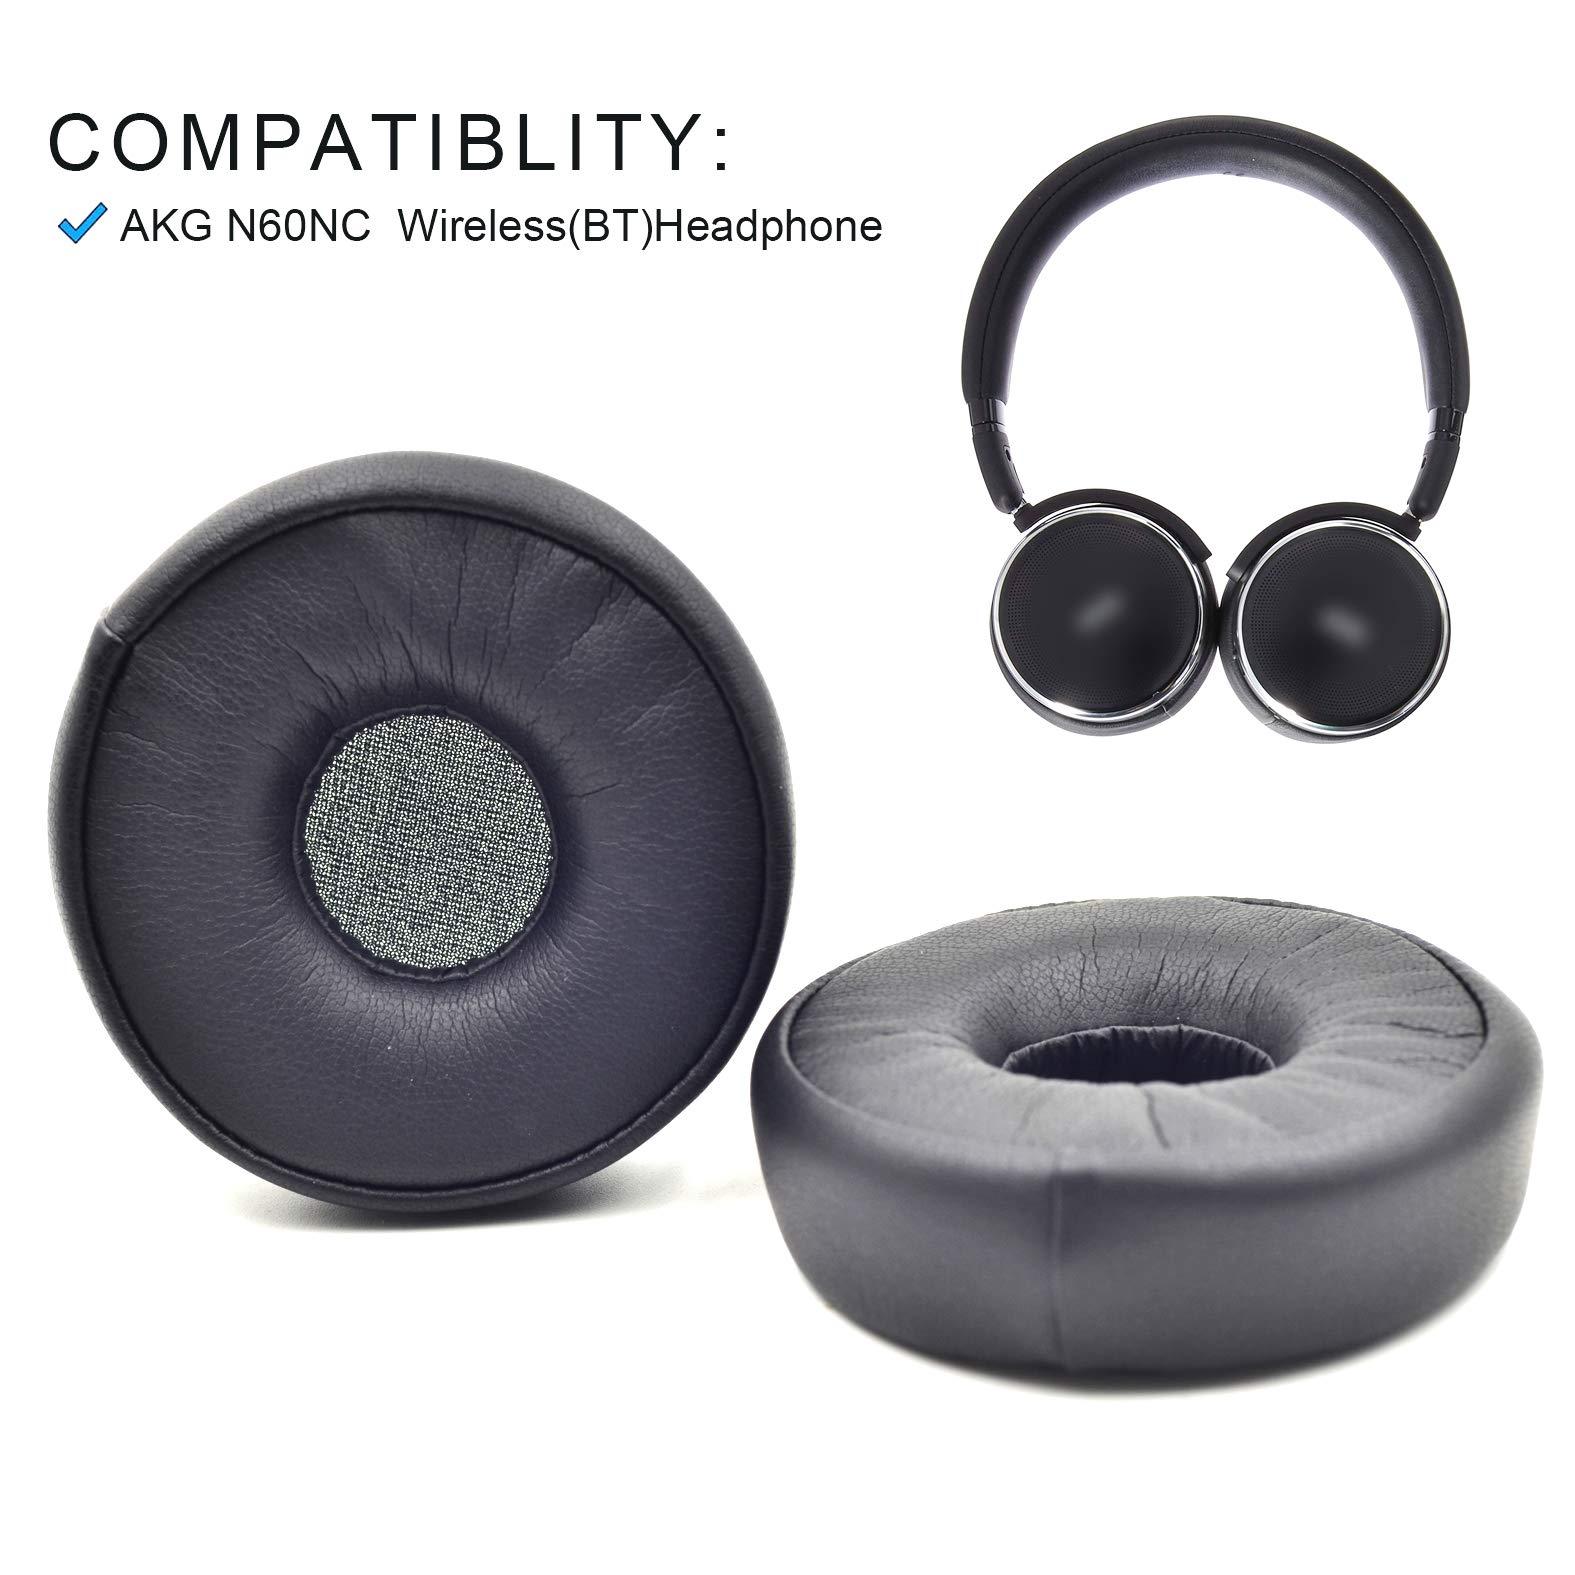 Almohadillas Auriculares AKG N60NC WIRELESS BLUETOOTH (BLACK